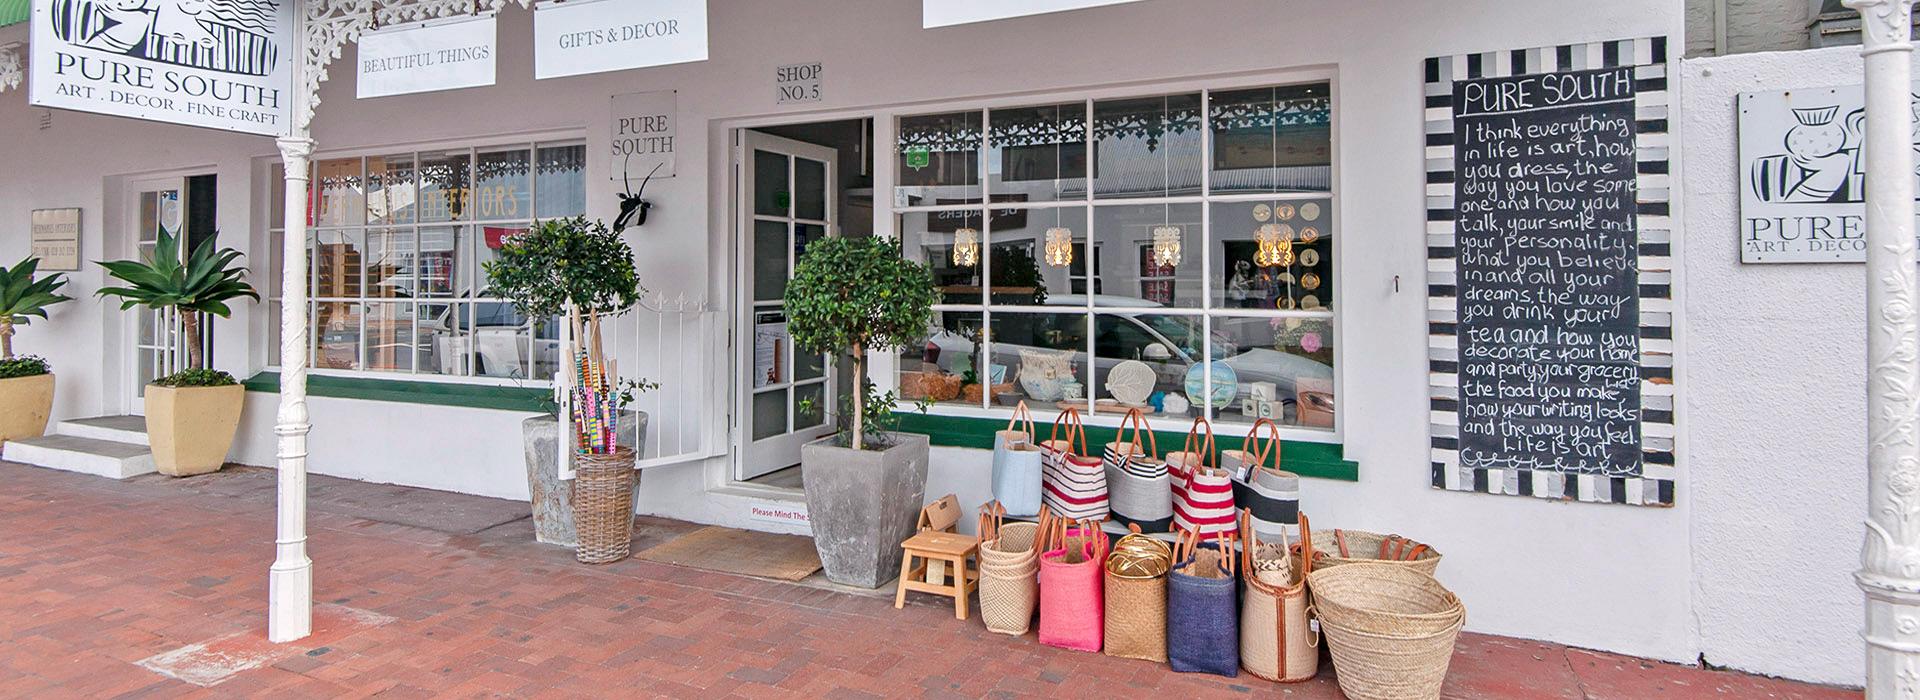 Handmade decor shop Hermanus South Africa